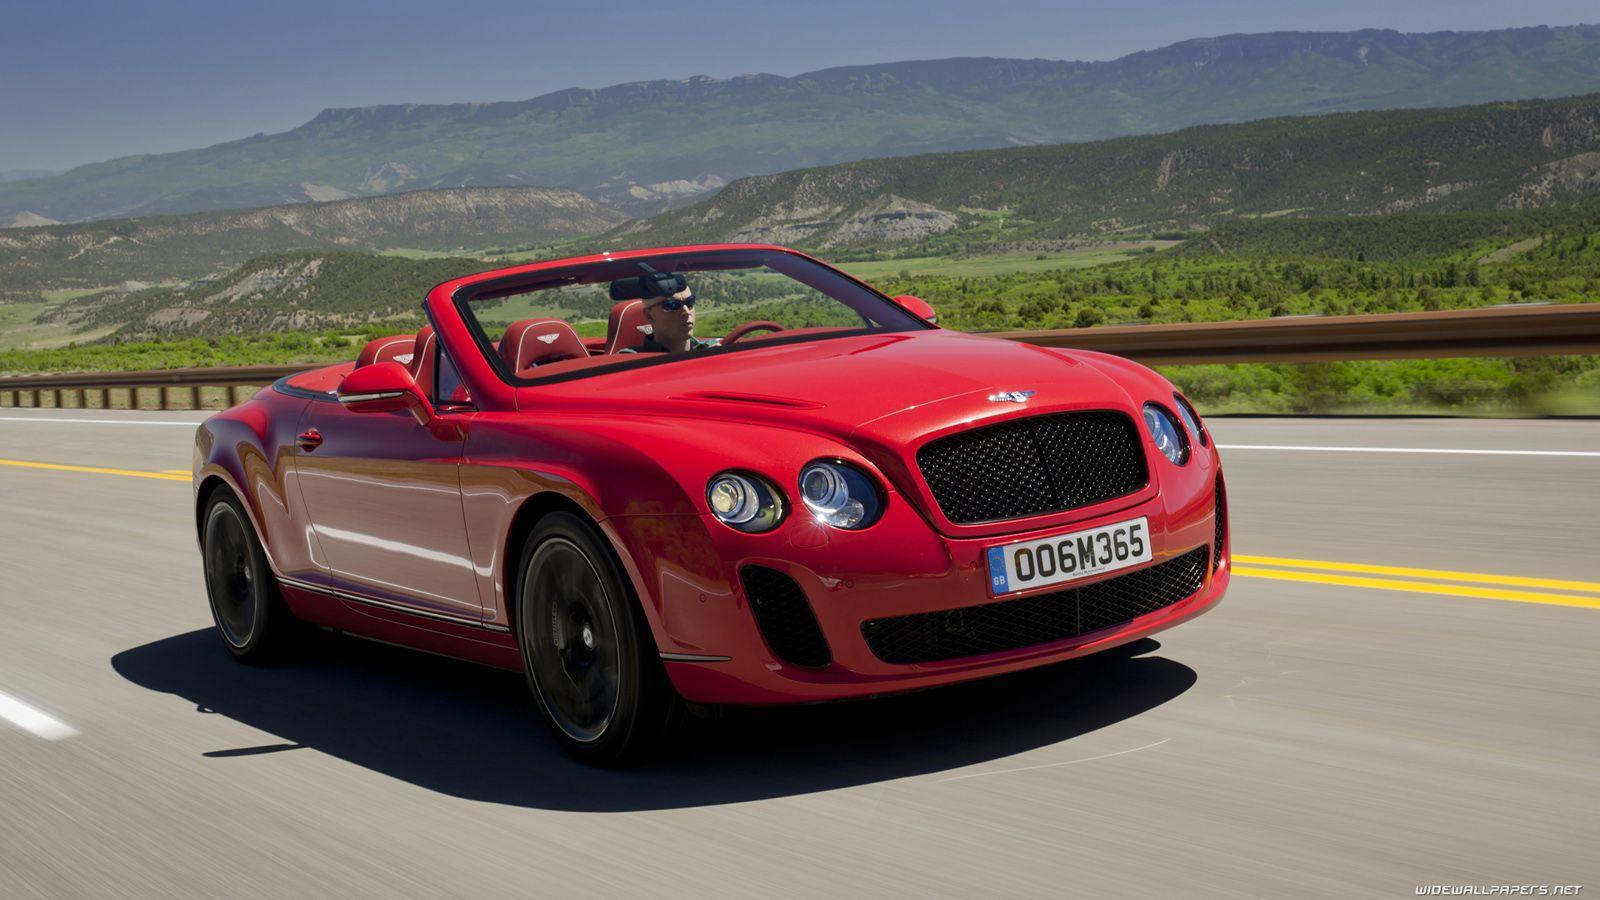 Supersport dream cars bentley coupe bentley gt html bentley for sale bentley continental gt convertible barbie plush